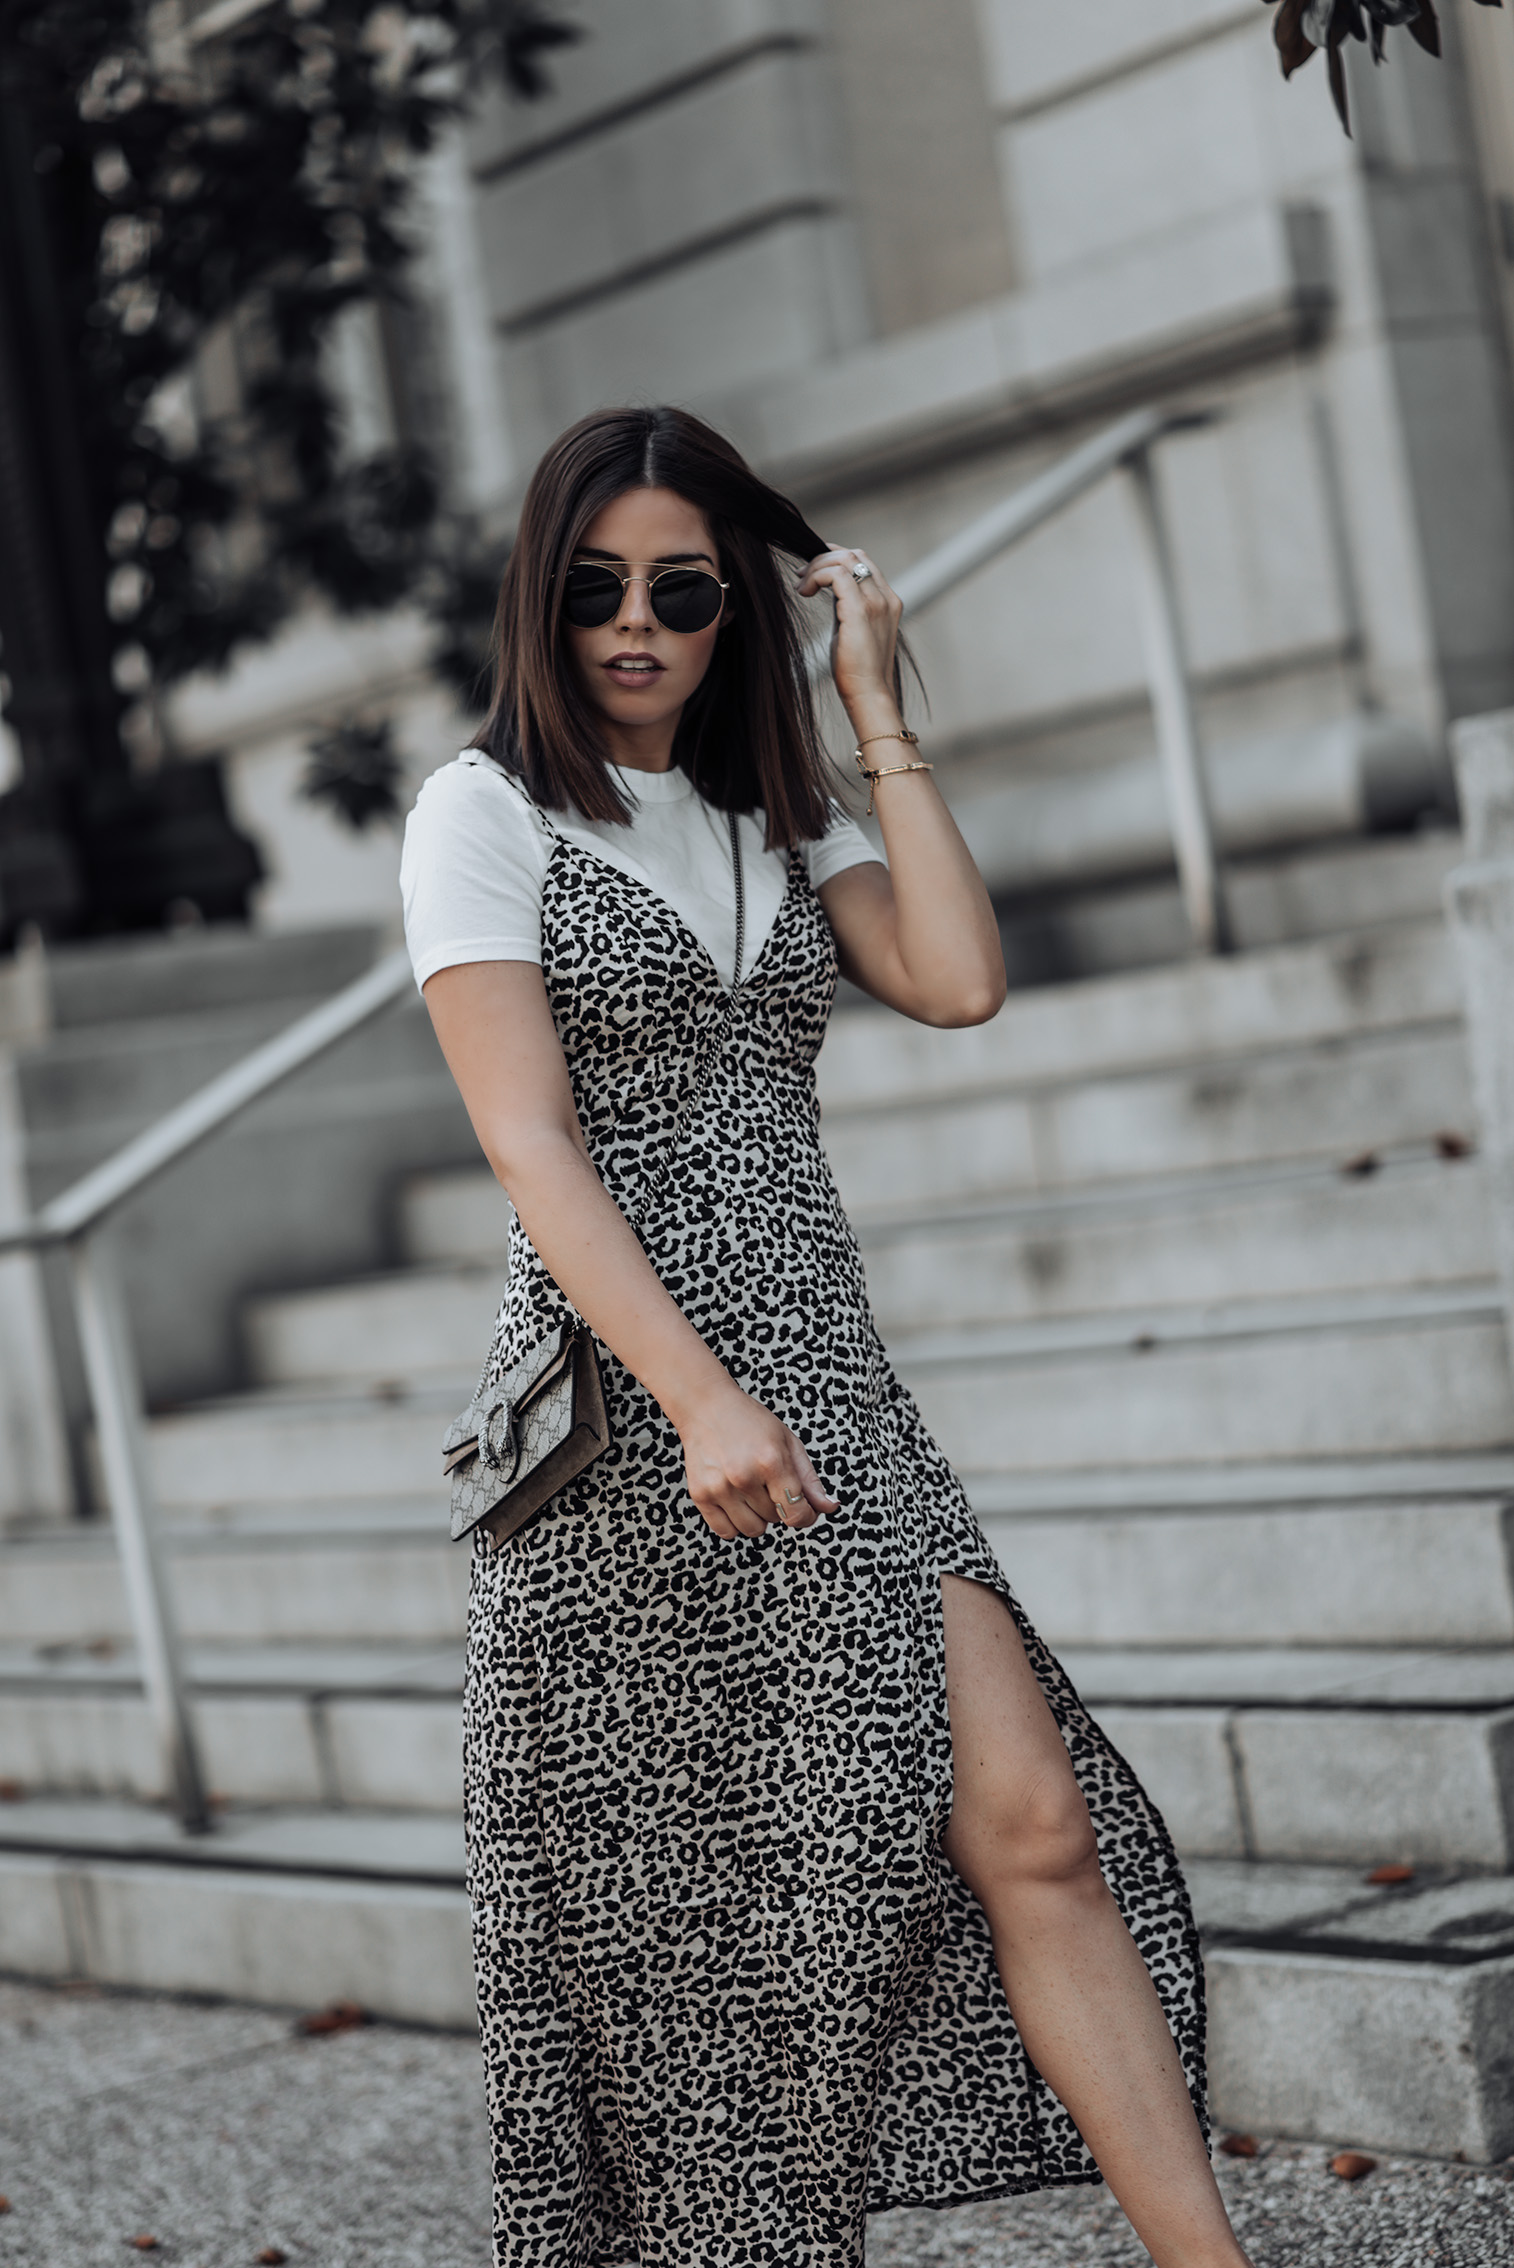 Leopard |Gucci Mini | Leopard Print Slip Dress | Perfect Fit Tee | Superga Platform Sneakers | #liketkit #streetstyle #gucci #casualoutfits